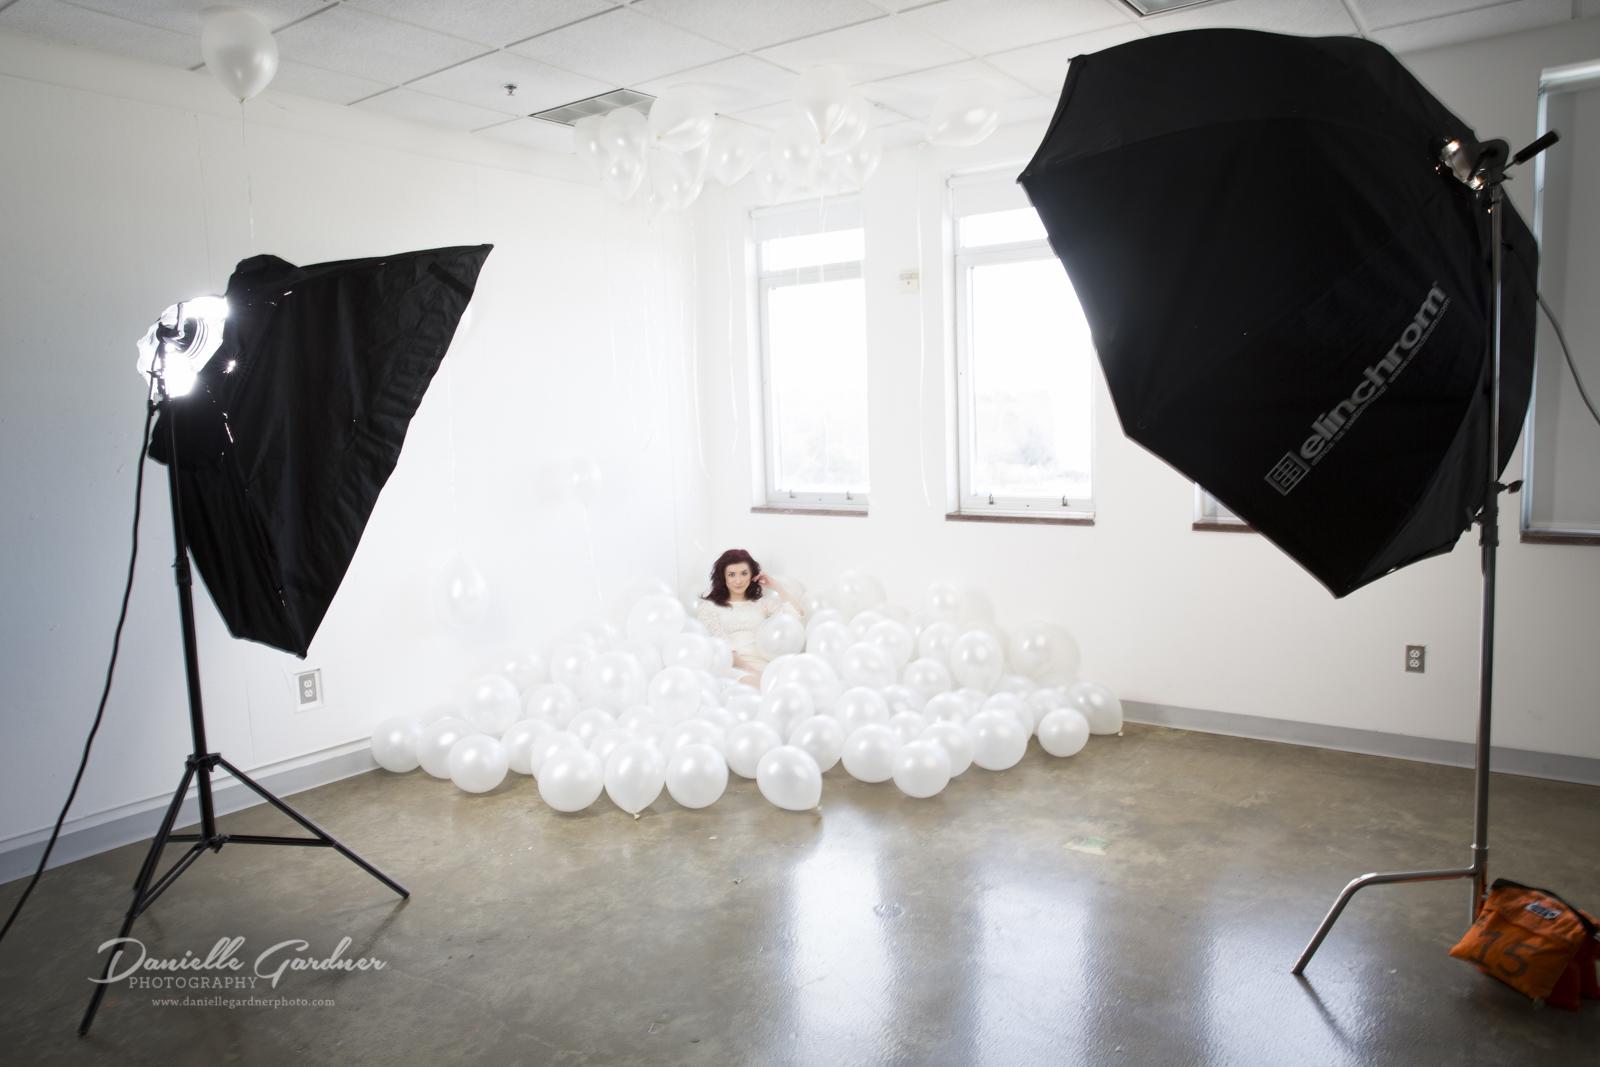 Danielle Gardner_Fashion_Balloons.jpg